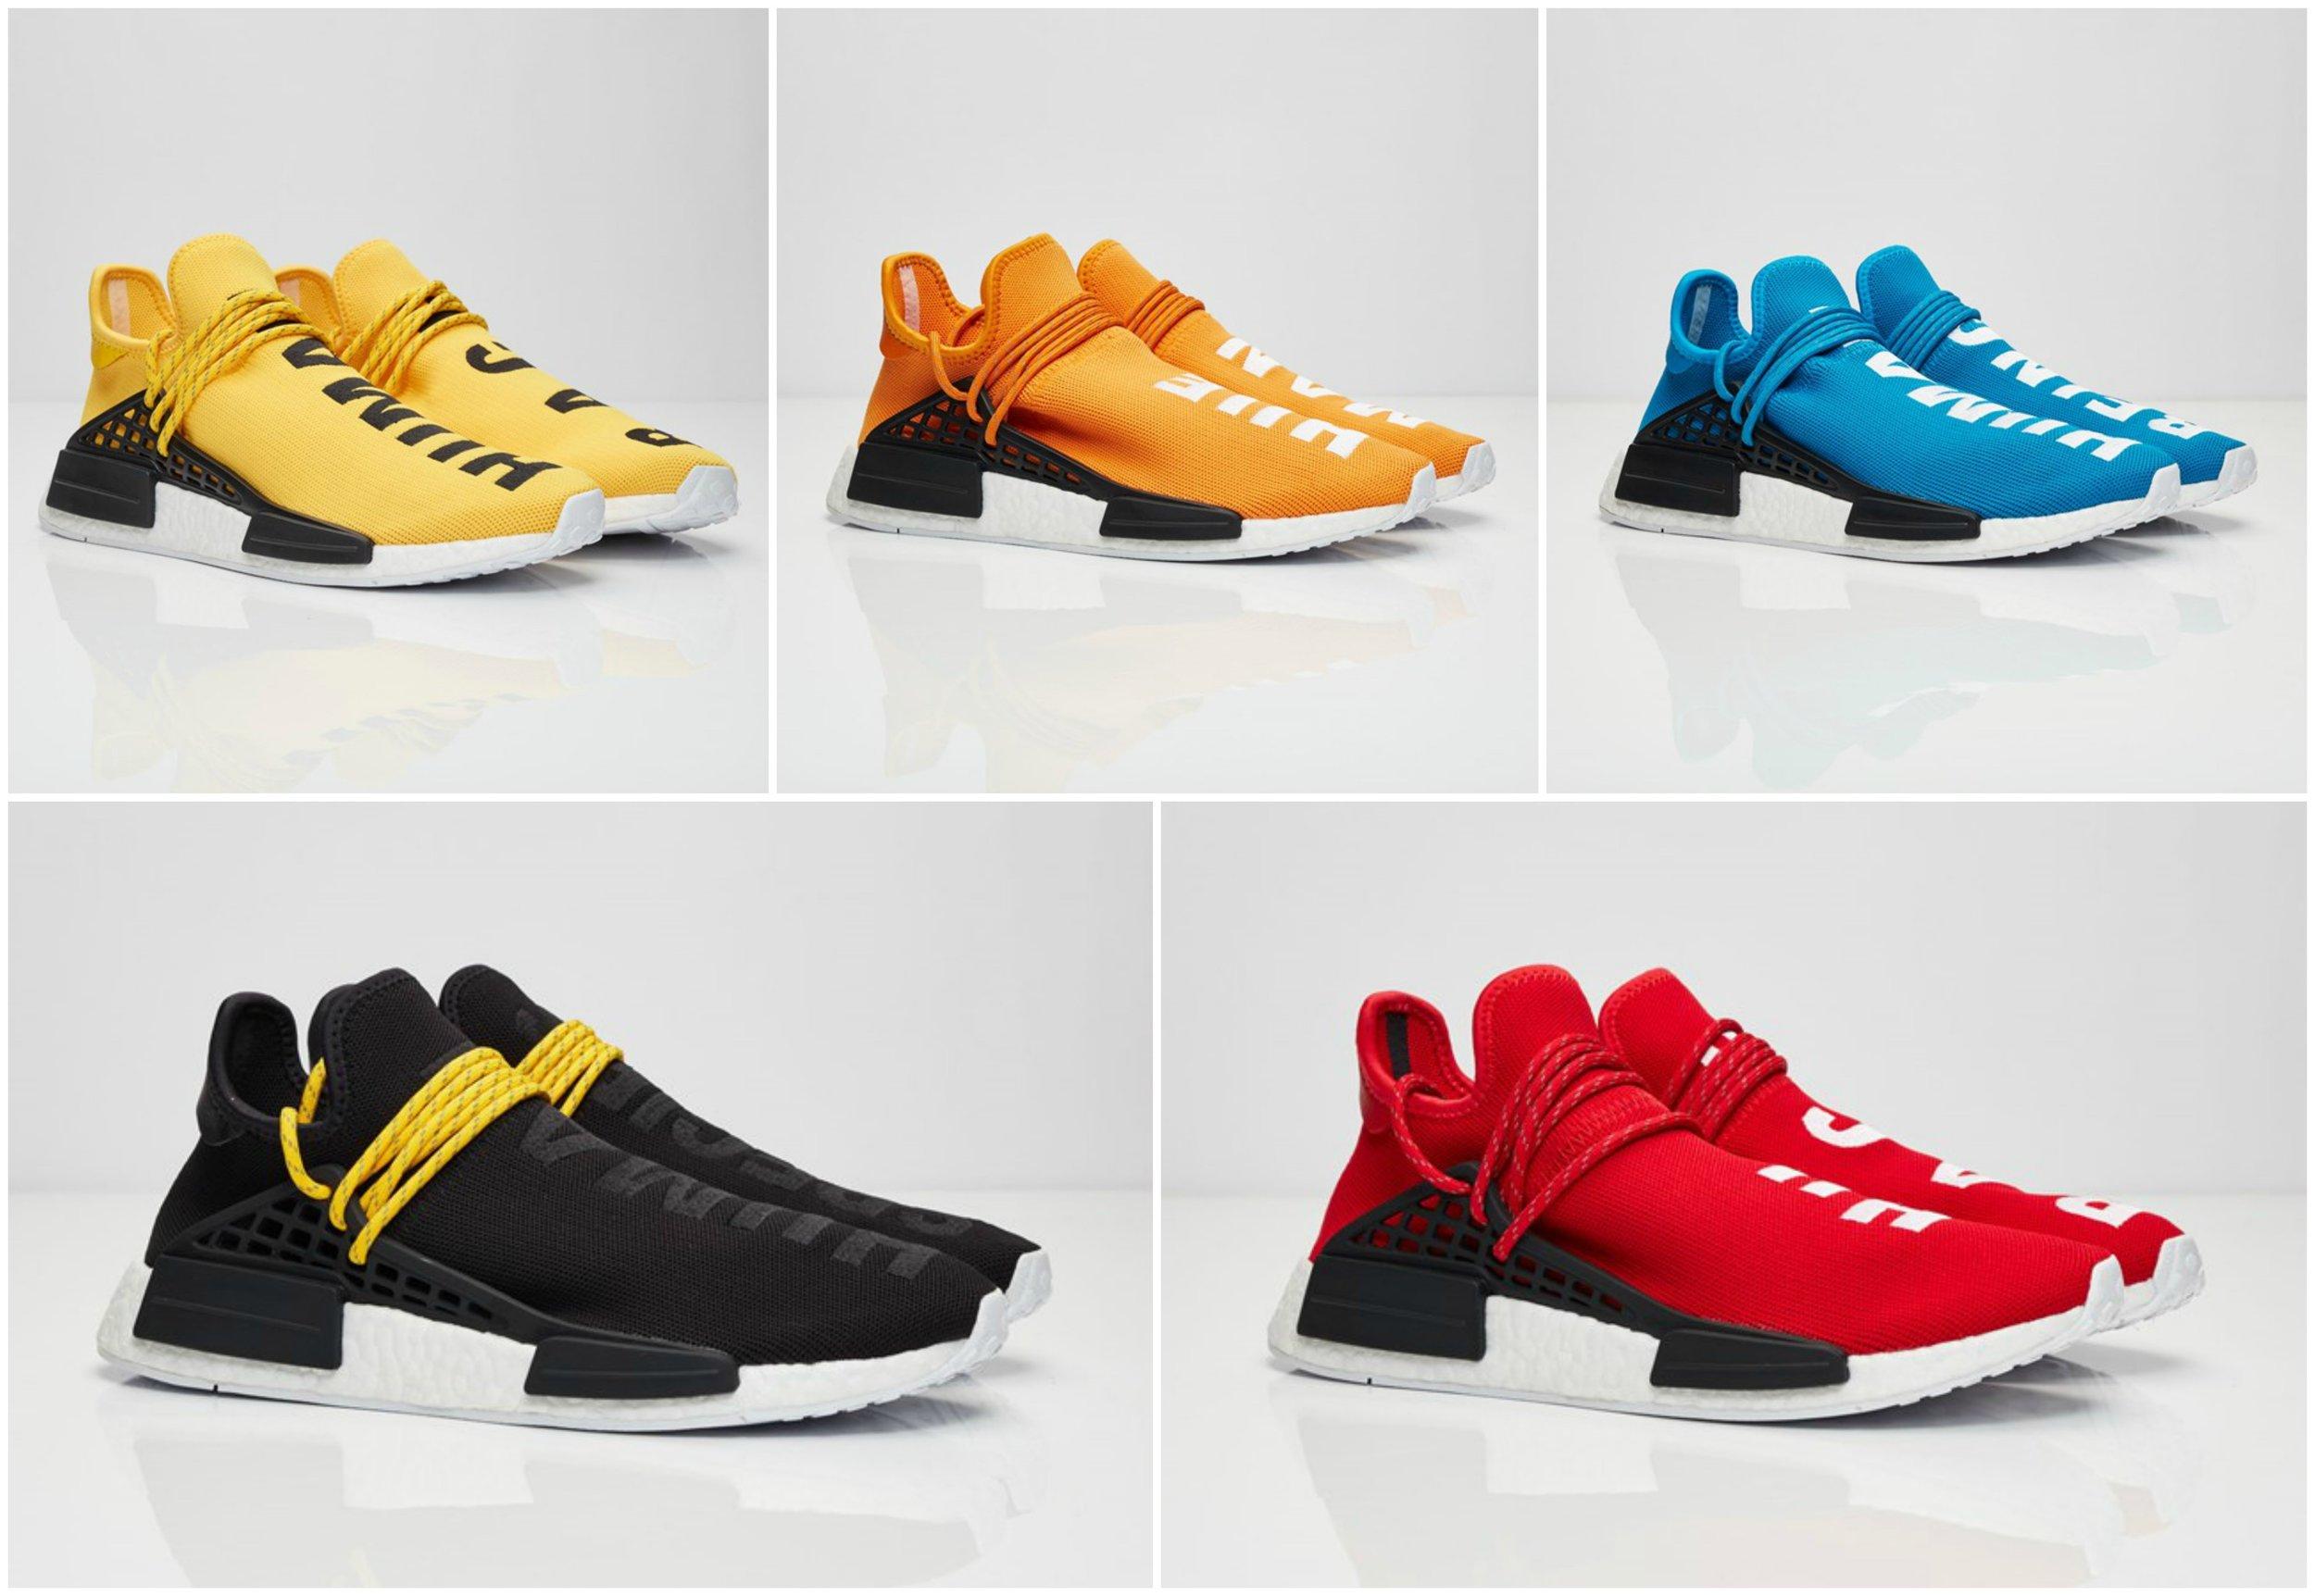 Pin by daniel on CH Adidas NMD Runner Kids | Adidas nmd